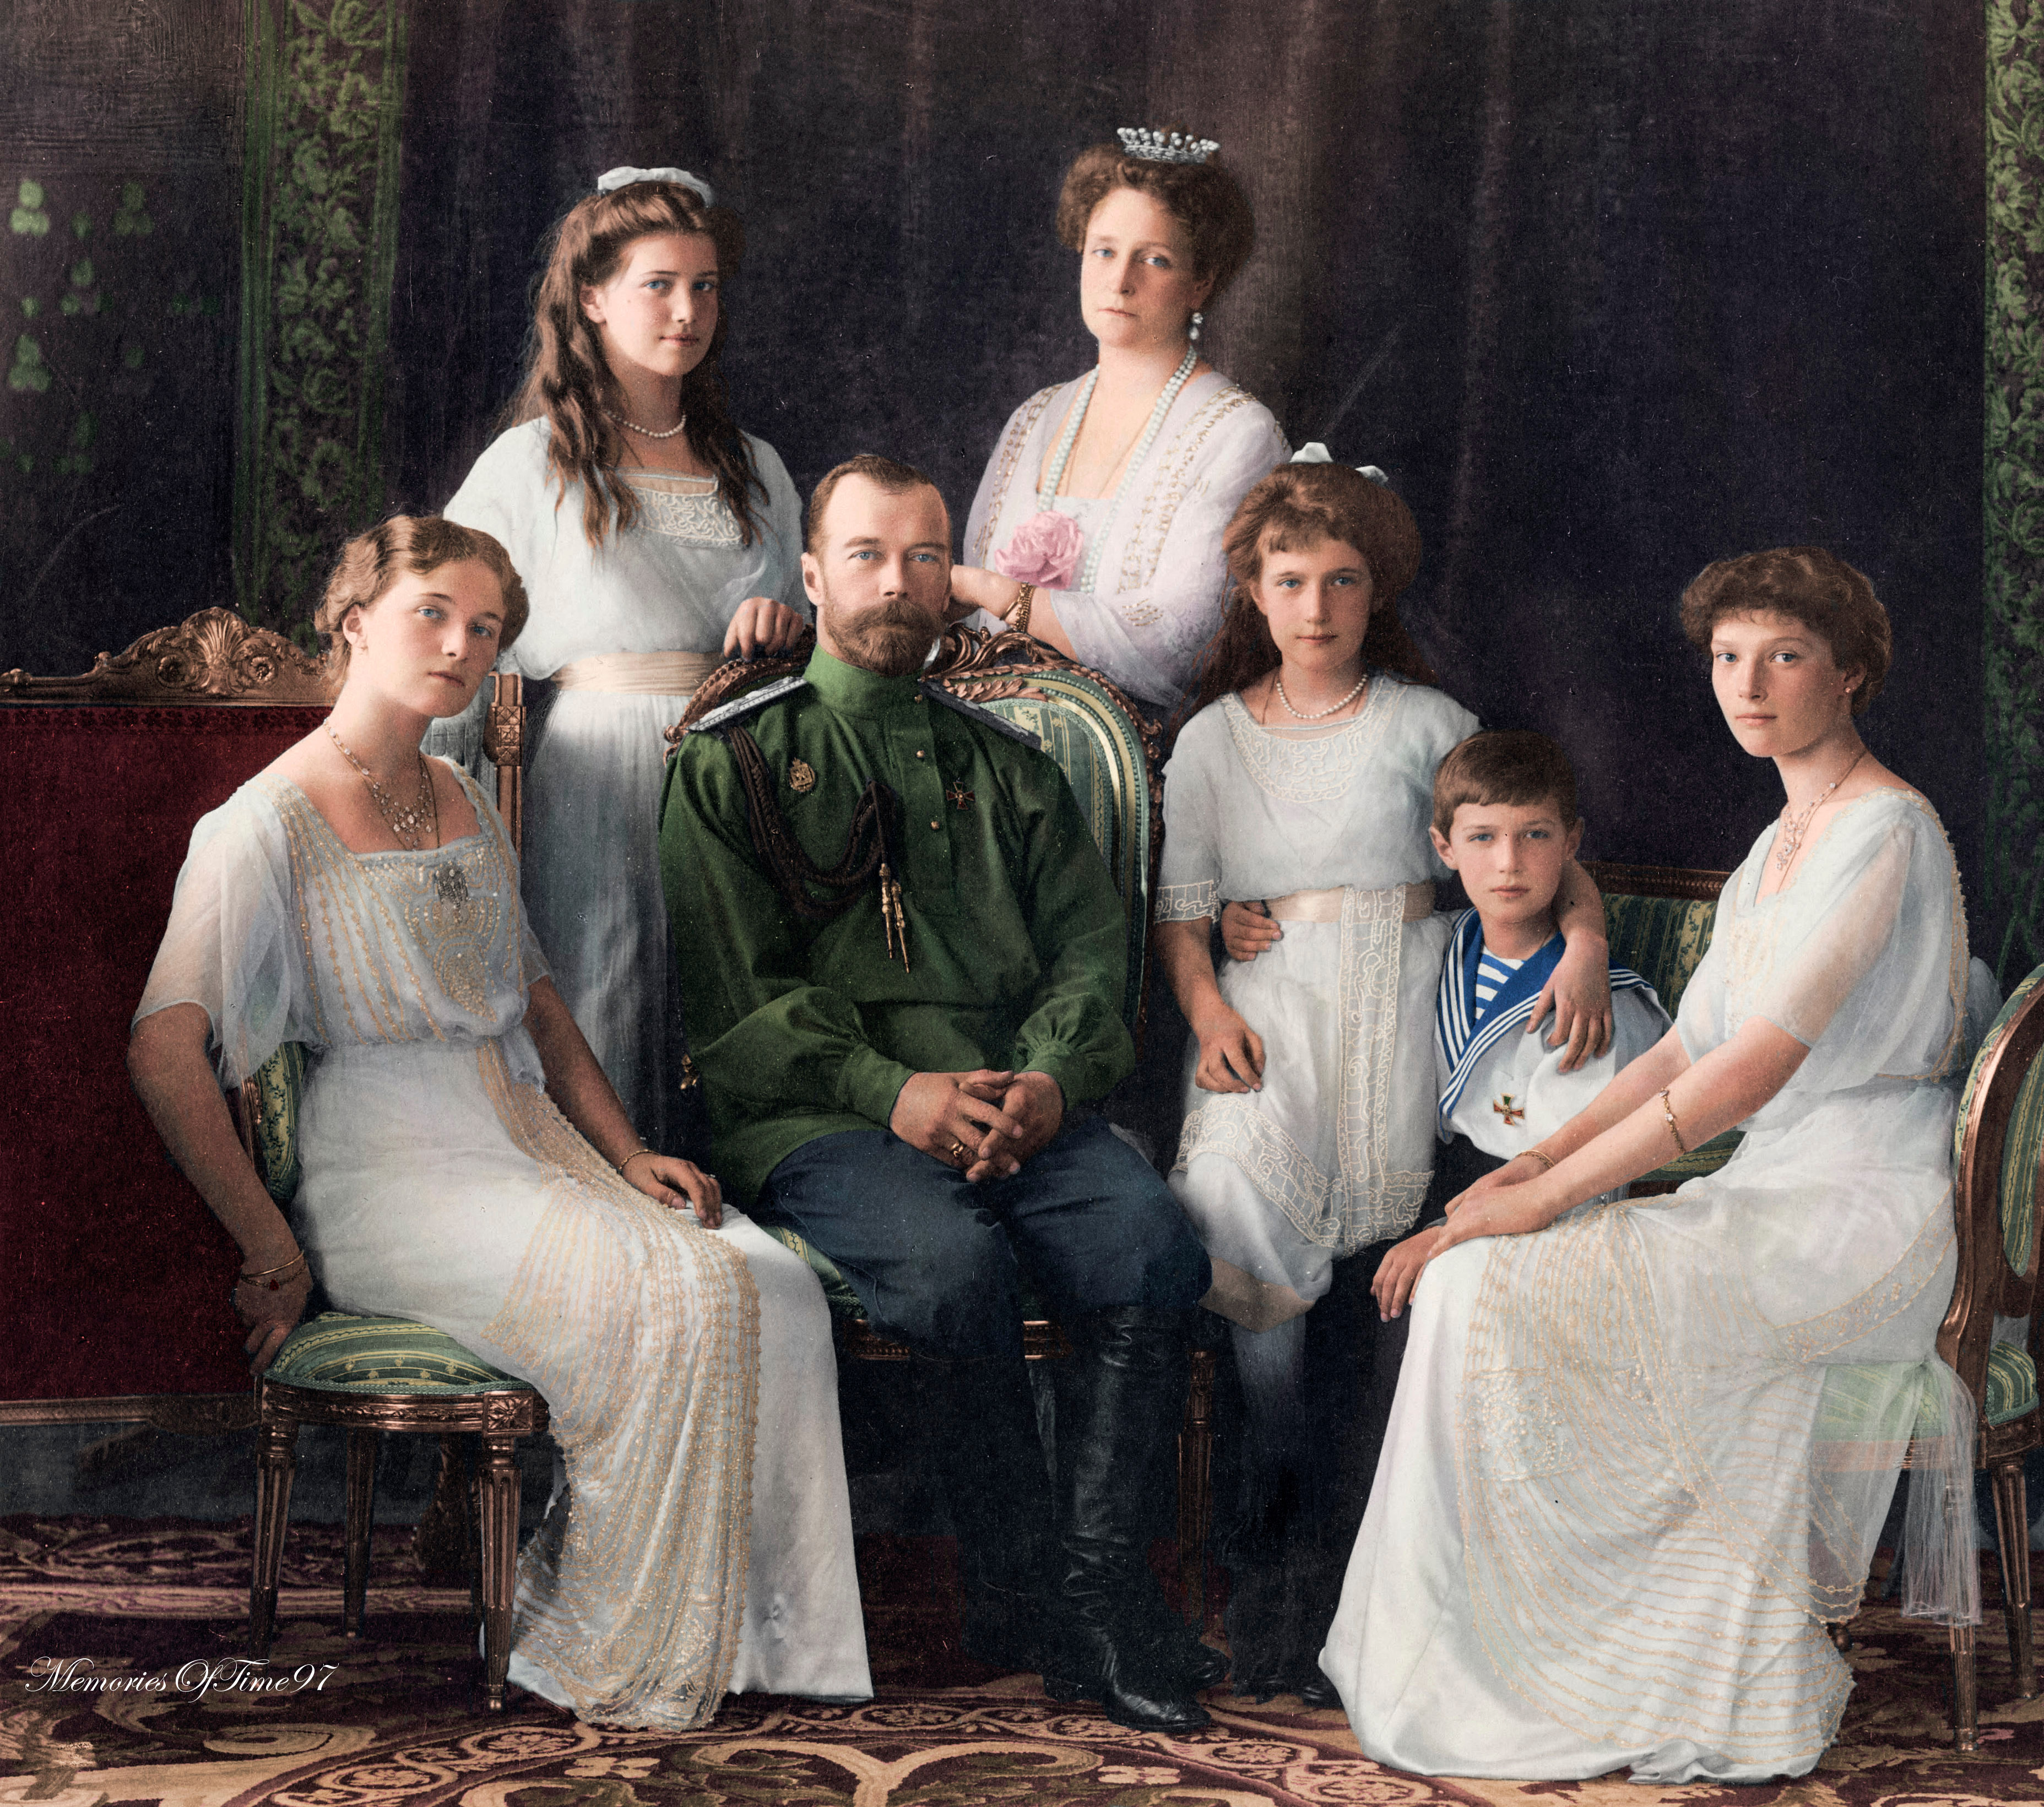 Romanov Family 1913 by MemoriesOfTime97